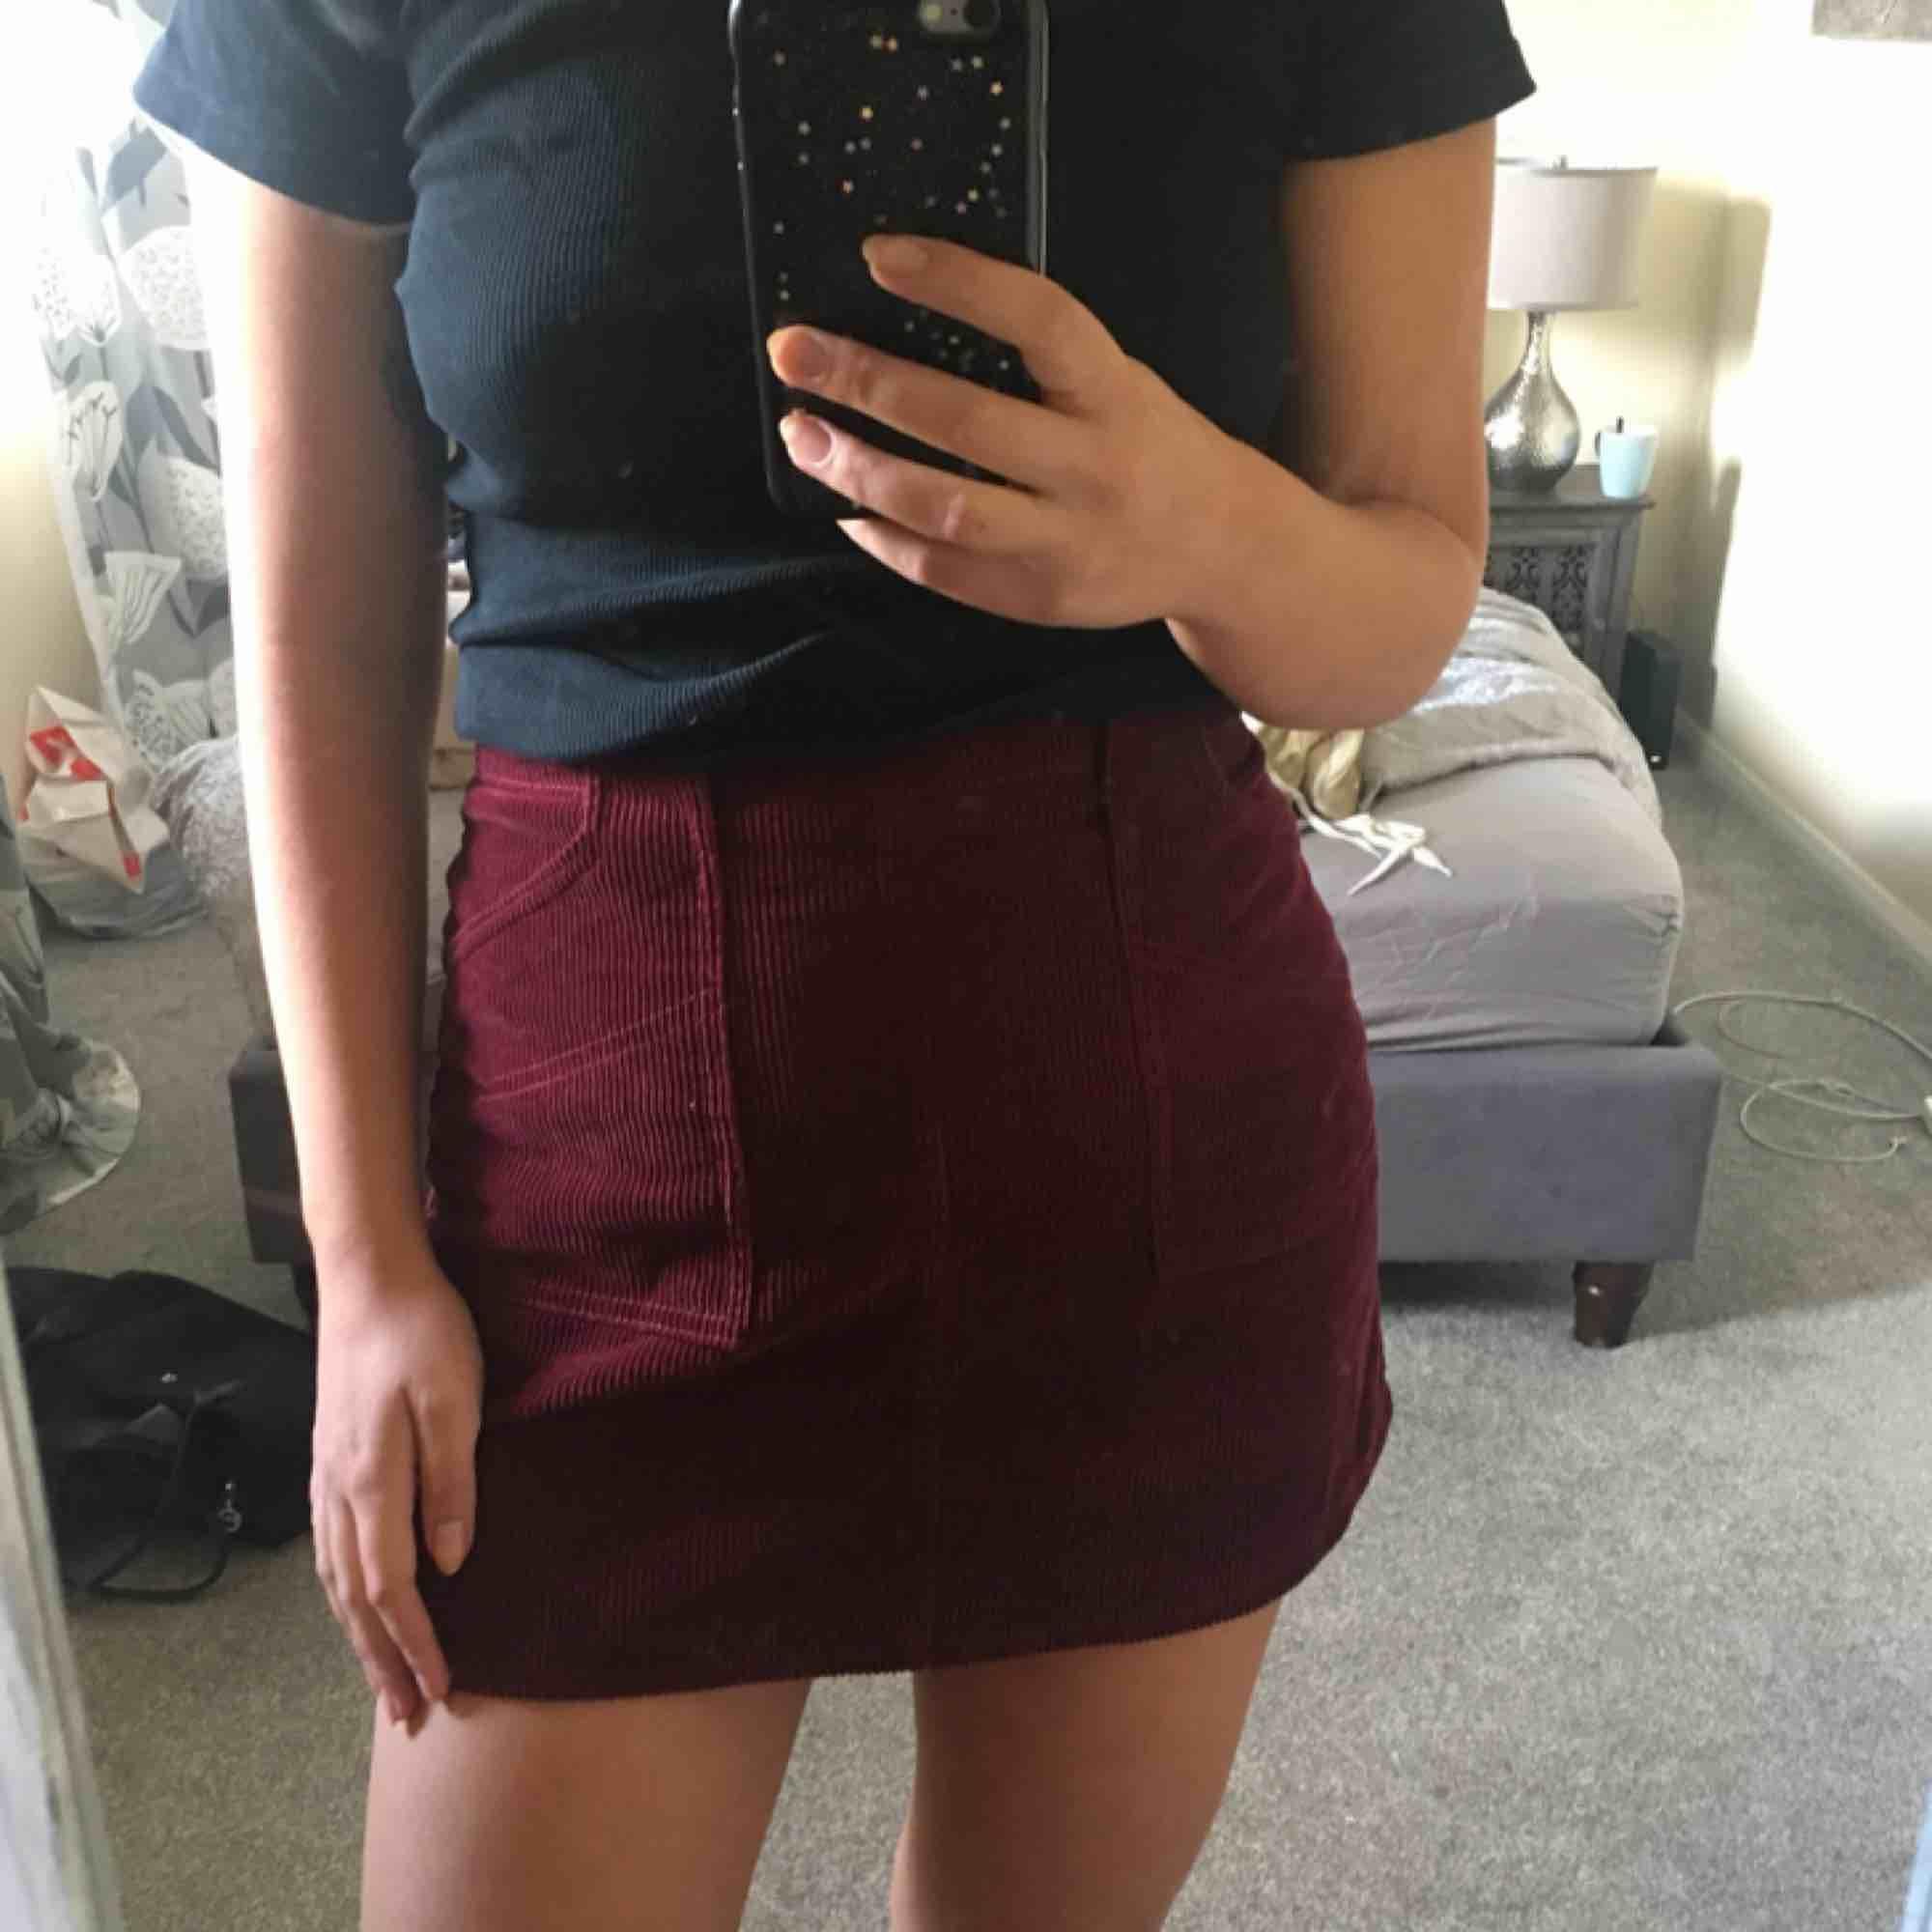 Manchester kjol från Urban Outfitters🍒. Kjolar.